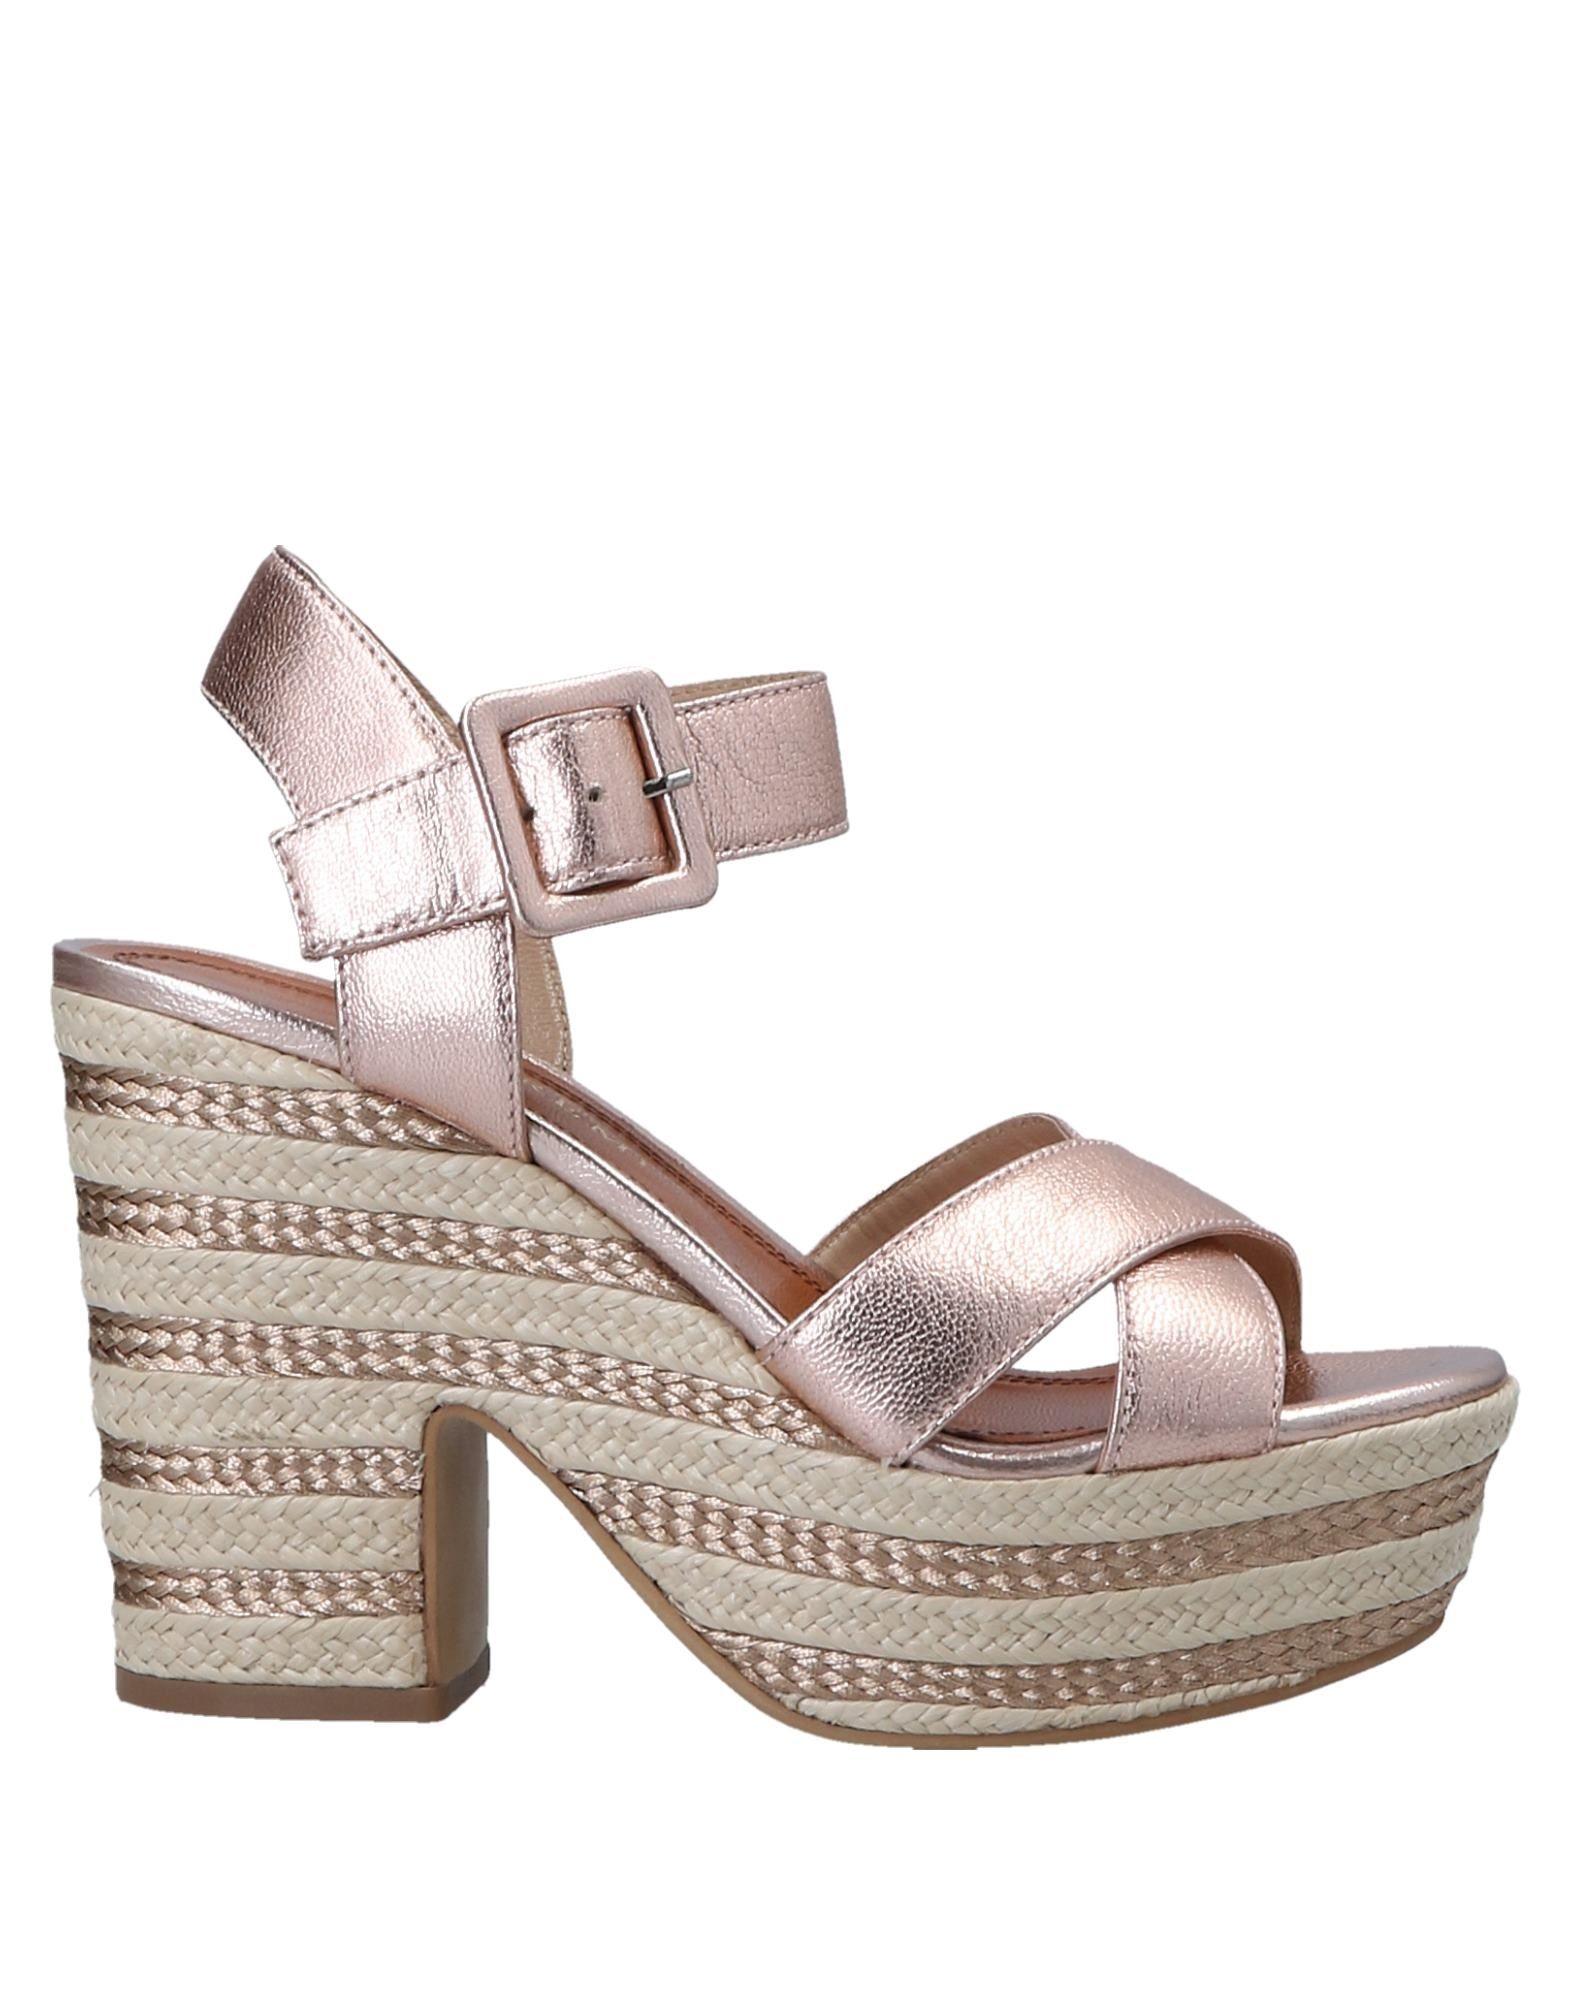 Bruno Premi Premi Sandals - Women Bruno Premi Premi Sandals online on  United Kingdom - 11556482UM 849f75